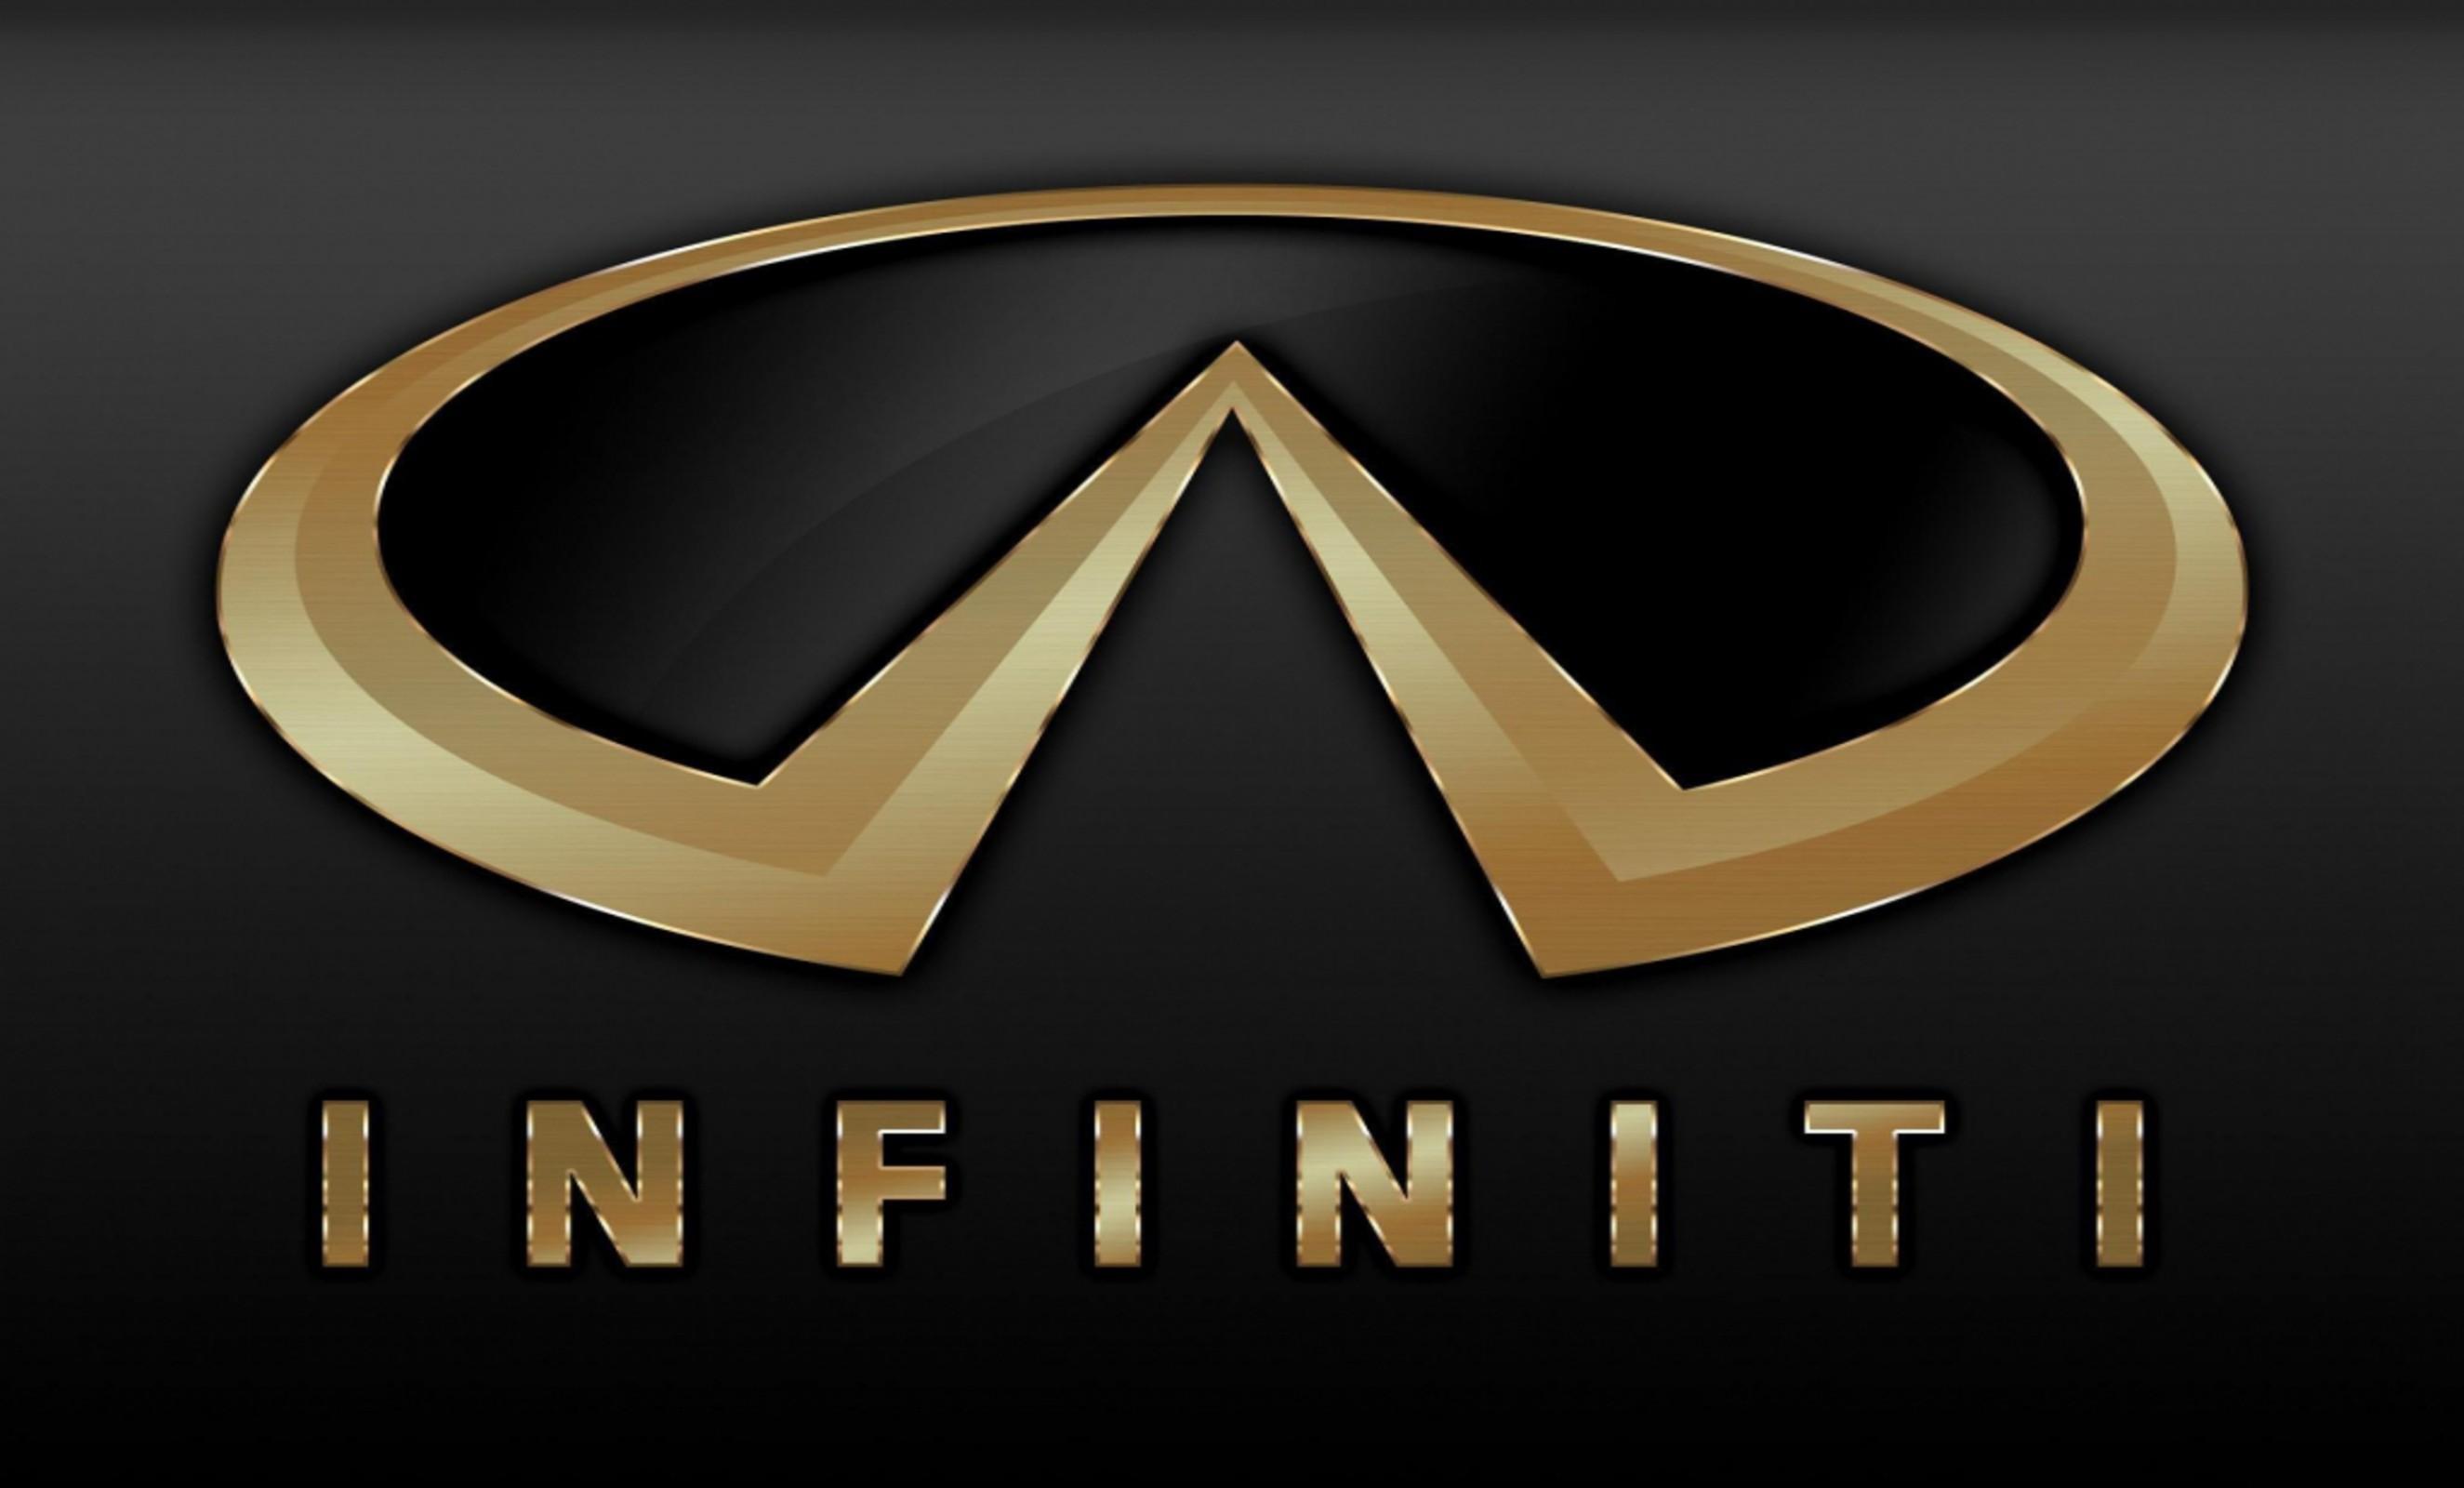 Res: 2650x1600, DOWNLOAD: infiniti-logo HDR wallpaper 2560 x 1600